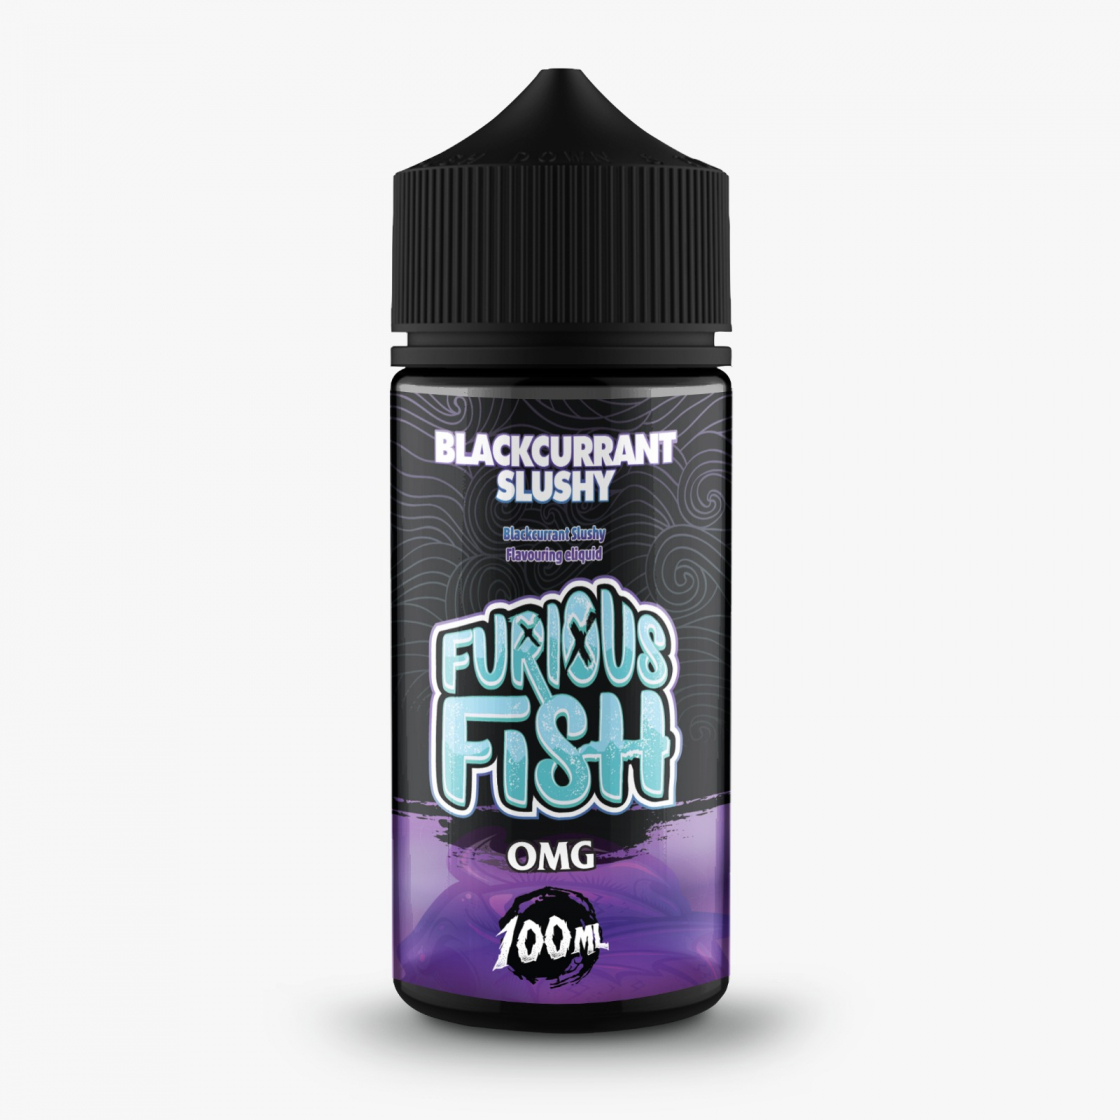 Furious Fish Shortfill